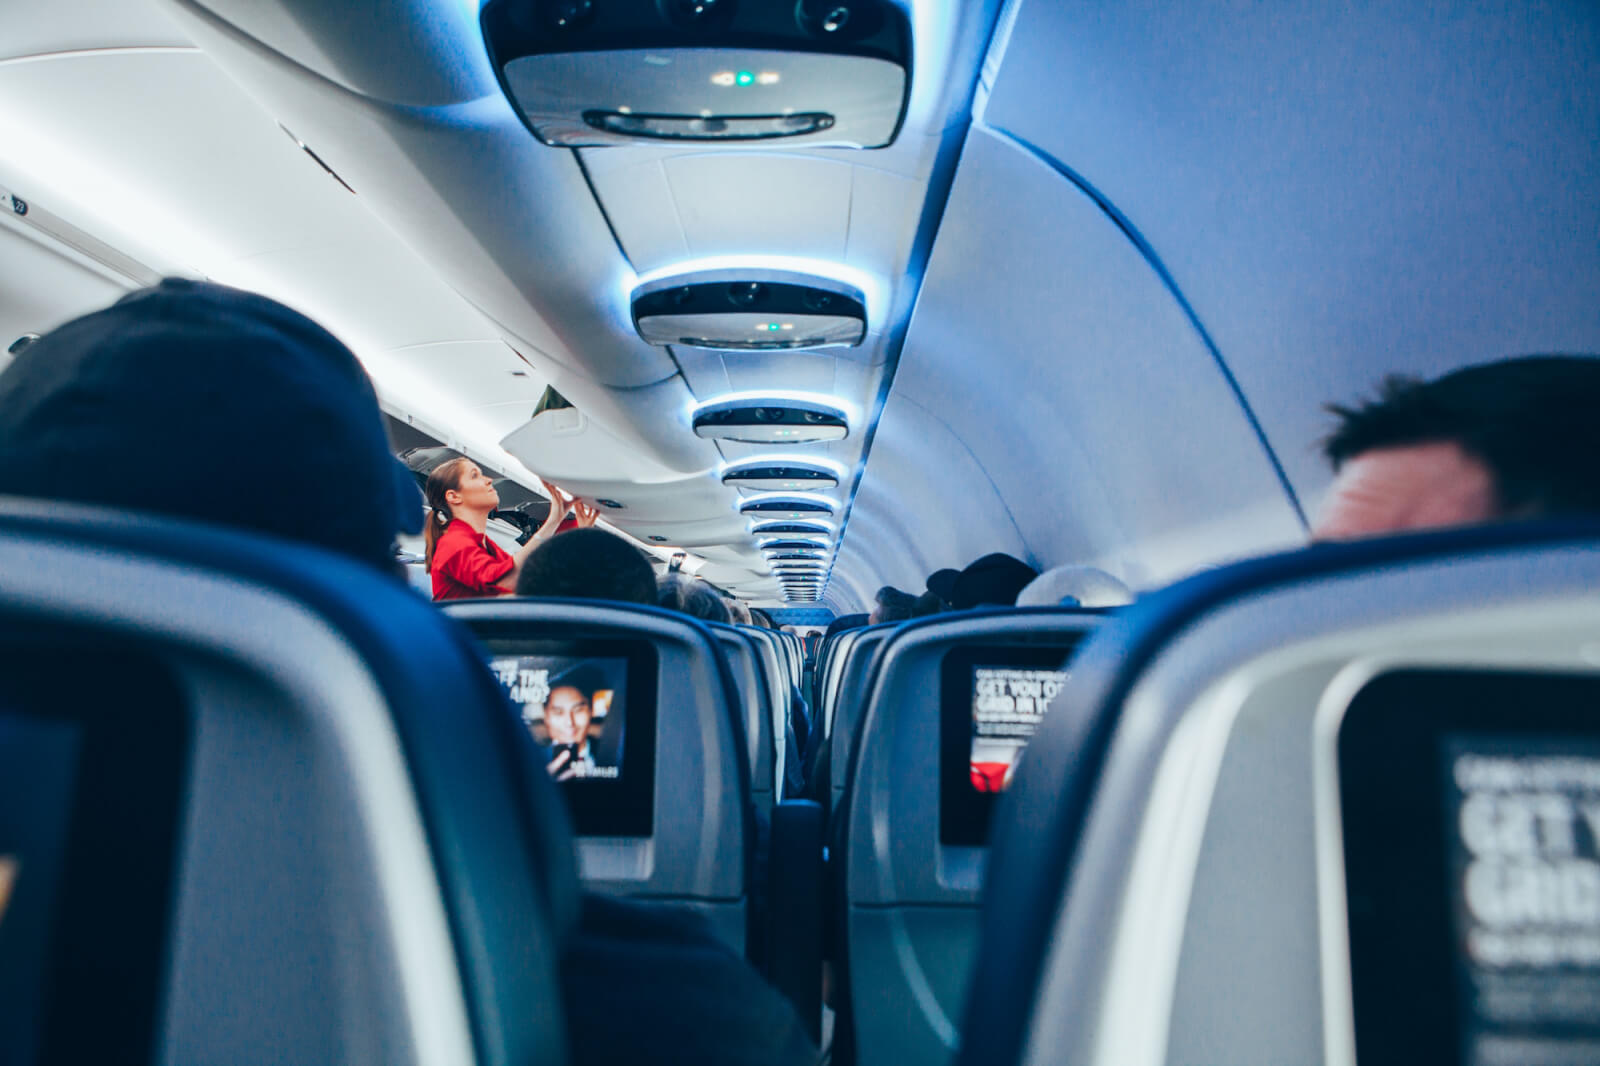 Ella-Bache-Hydra-Repulp'-Creme-Masque-Hyaluronic-Hydratante-–-Hyaluronic-Moisturising-Cream-Mask-abloomnova.net_-1600x1066 Skincare for long haul flights